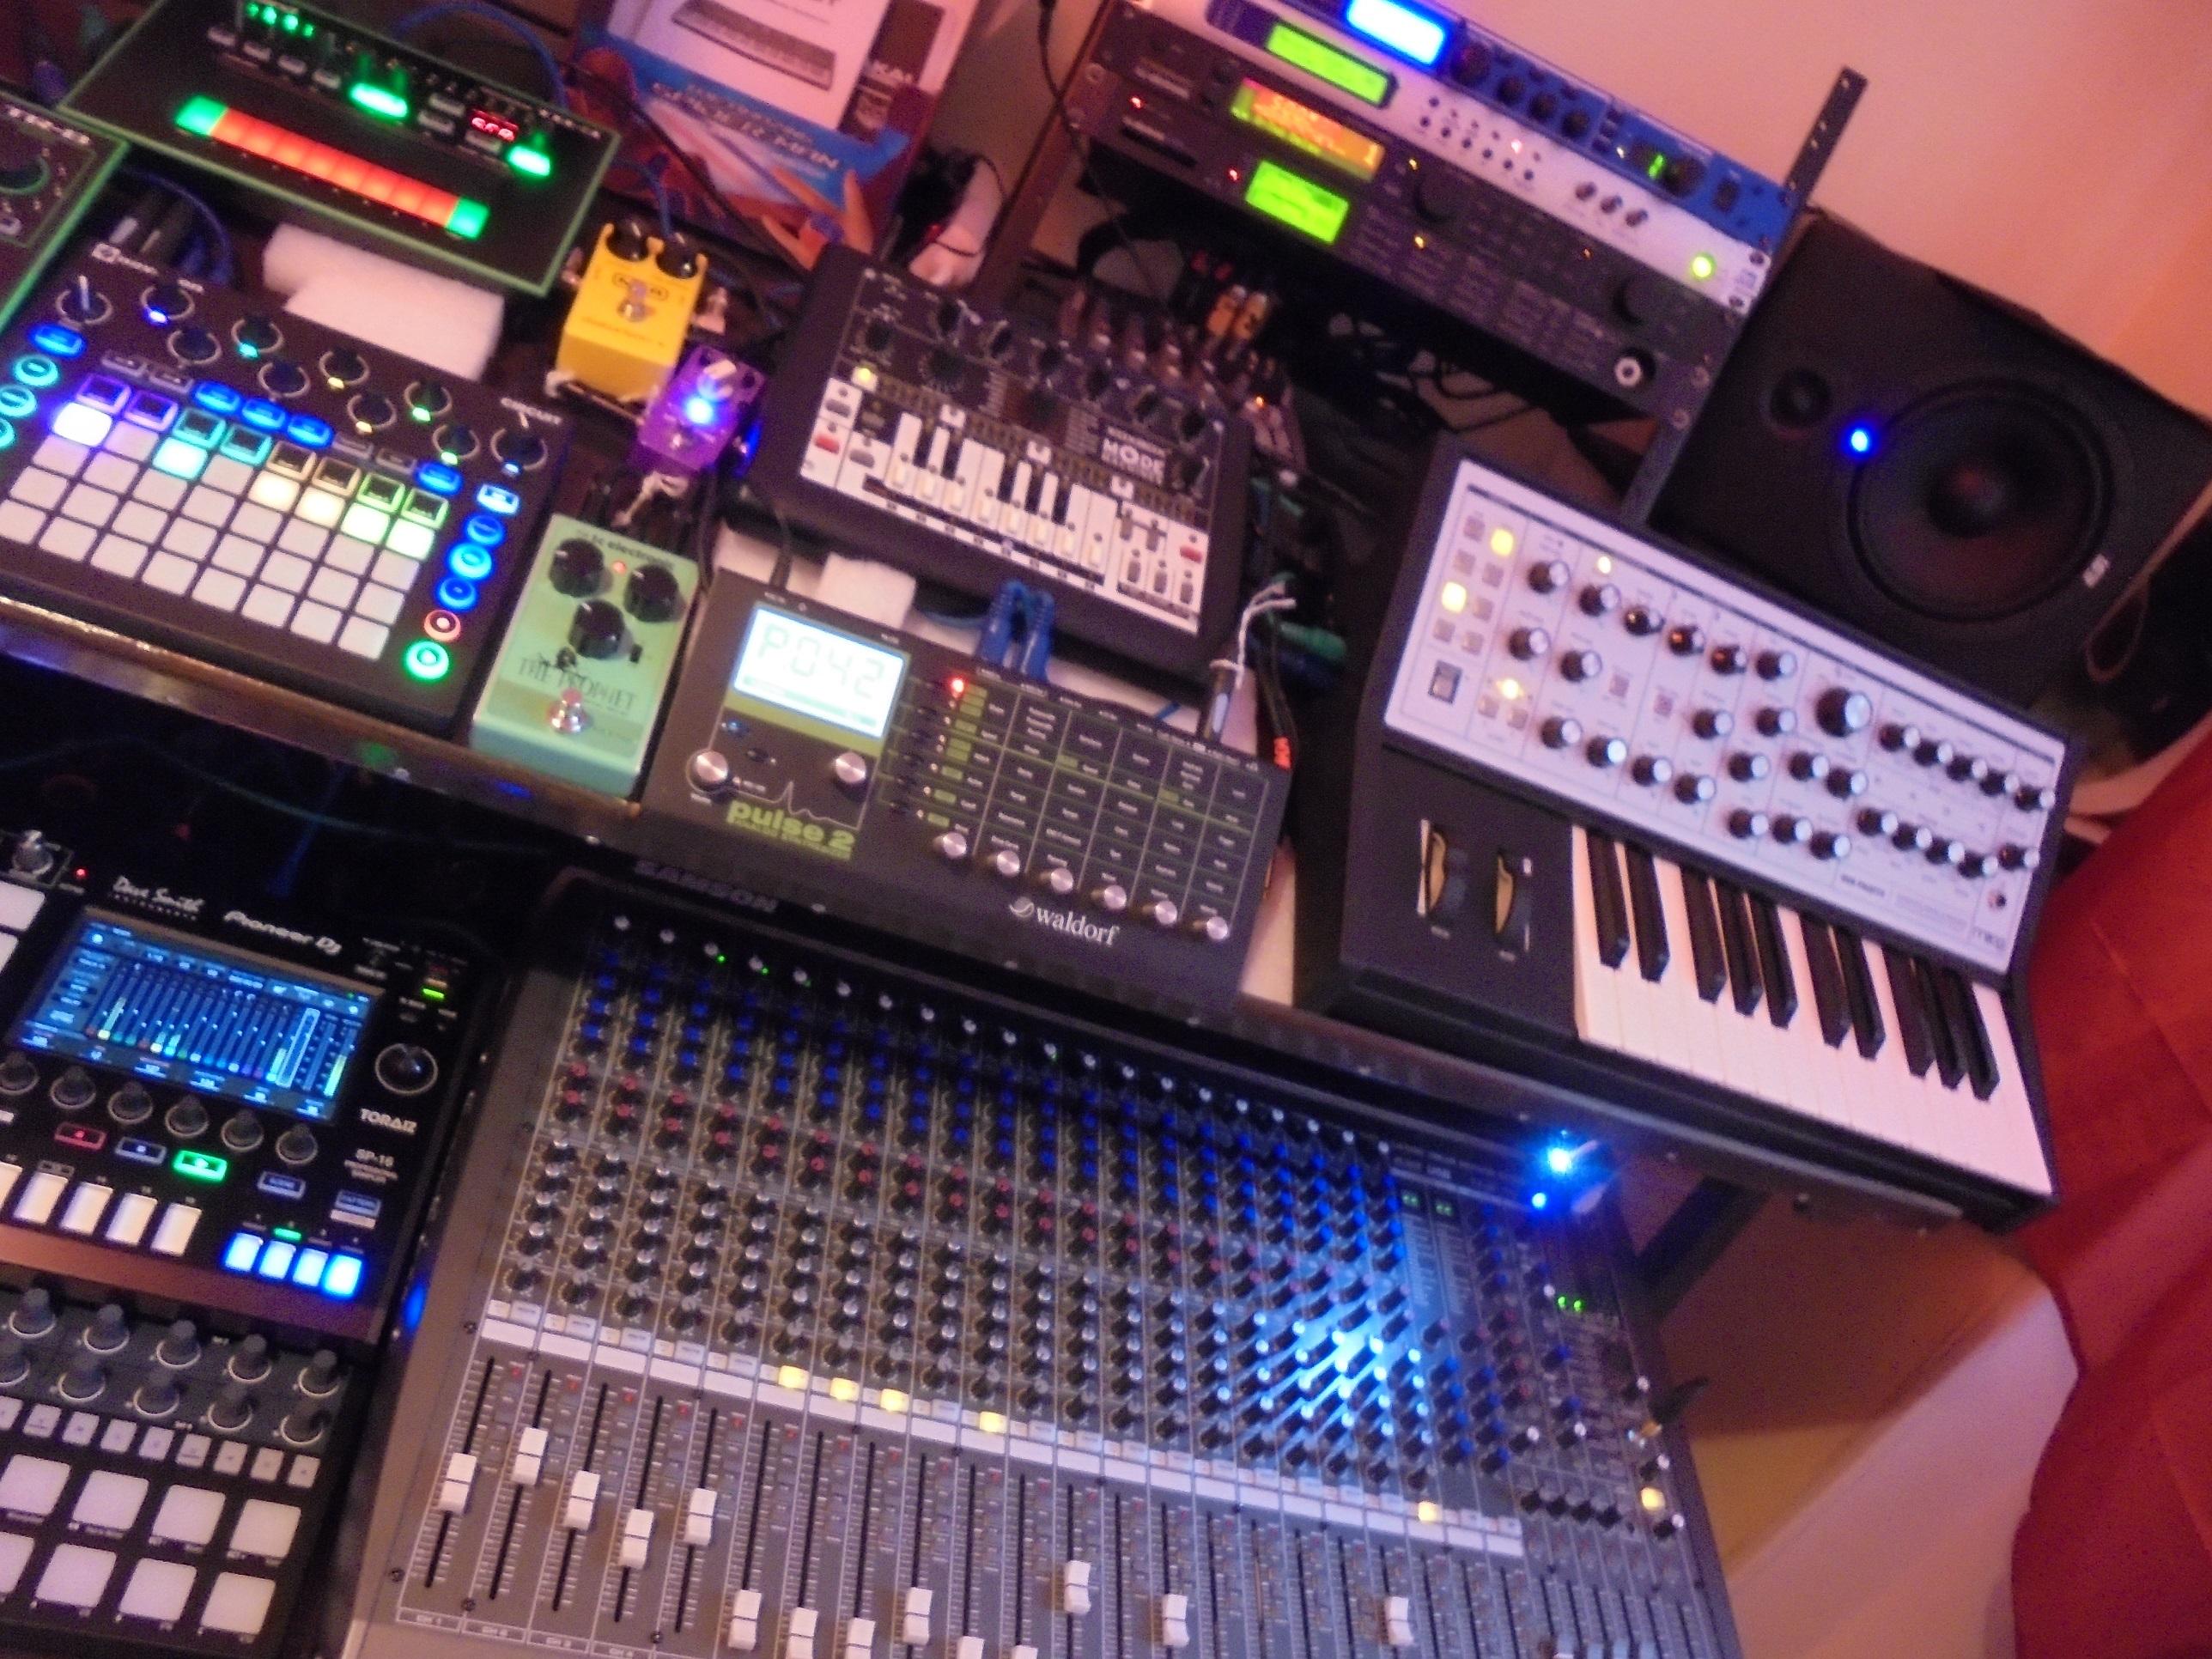 X0XB0X SOCKSBOX - Mode Machines x0xb0x Socksbox - Audiofanzine